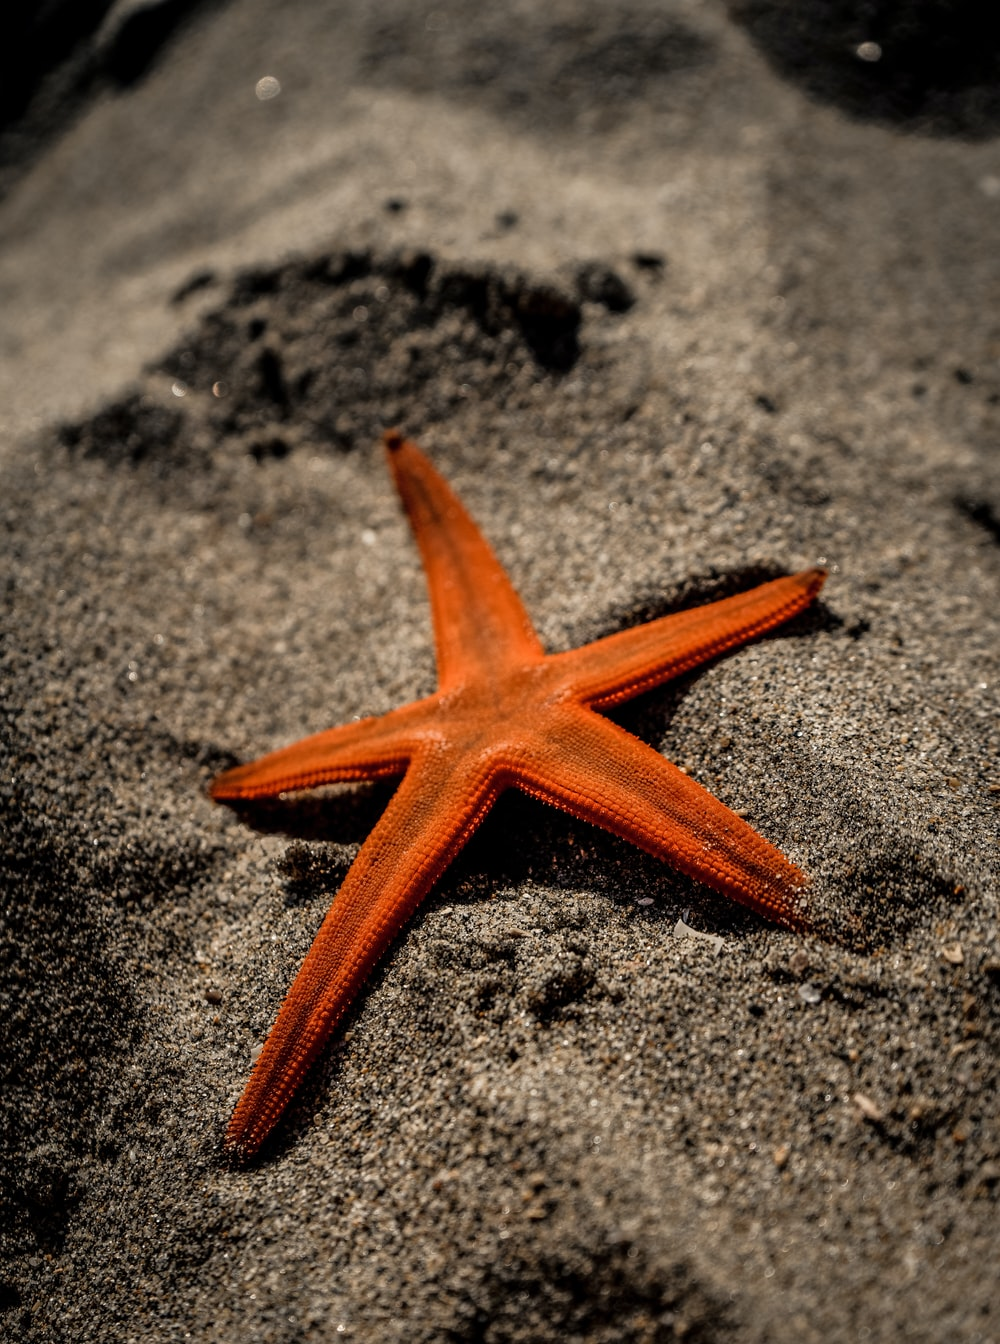 close-up photo of orange starfish on grey sand